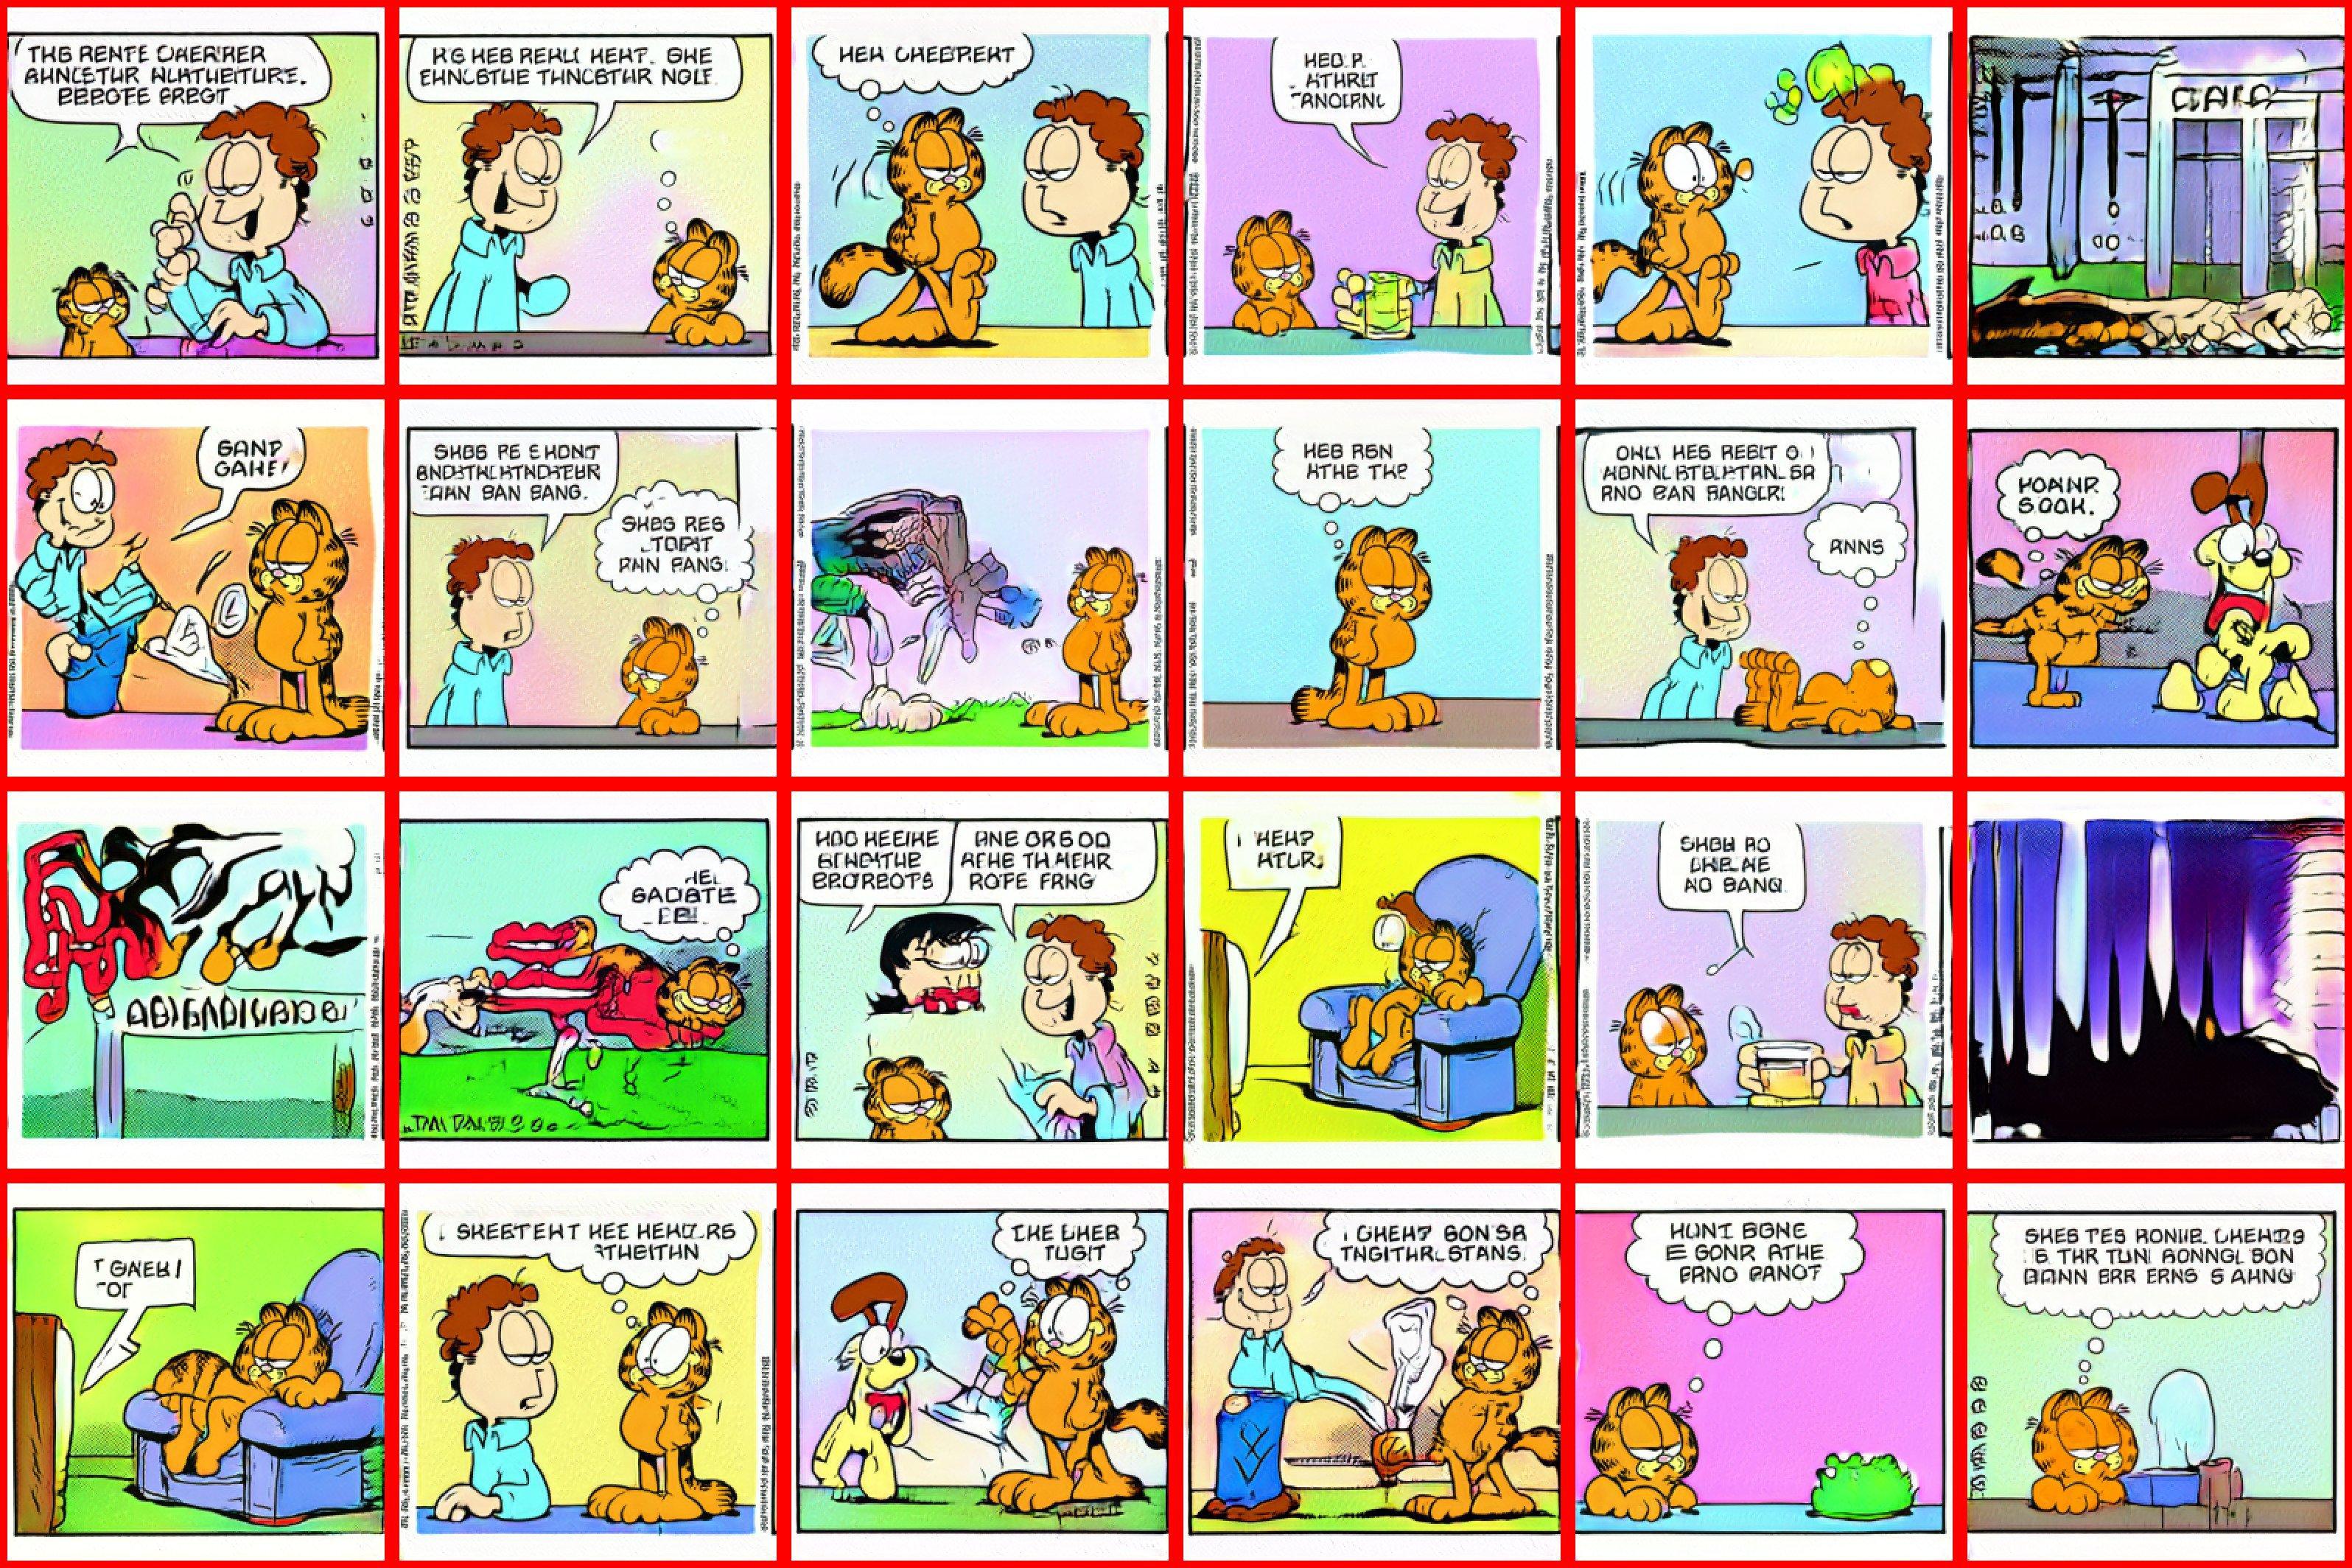 Garfield on Acid